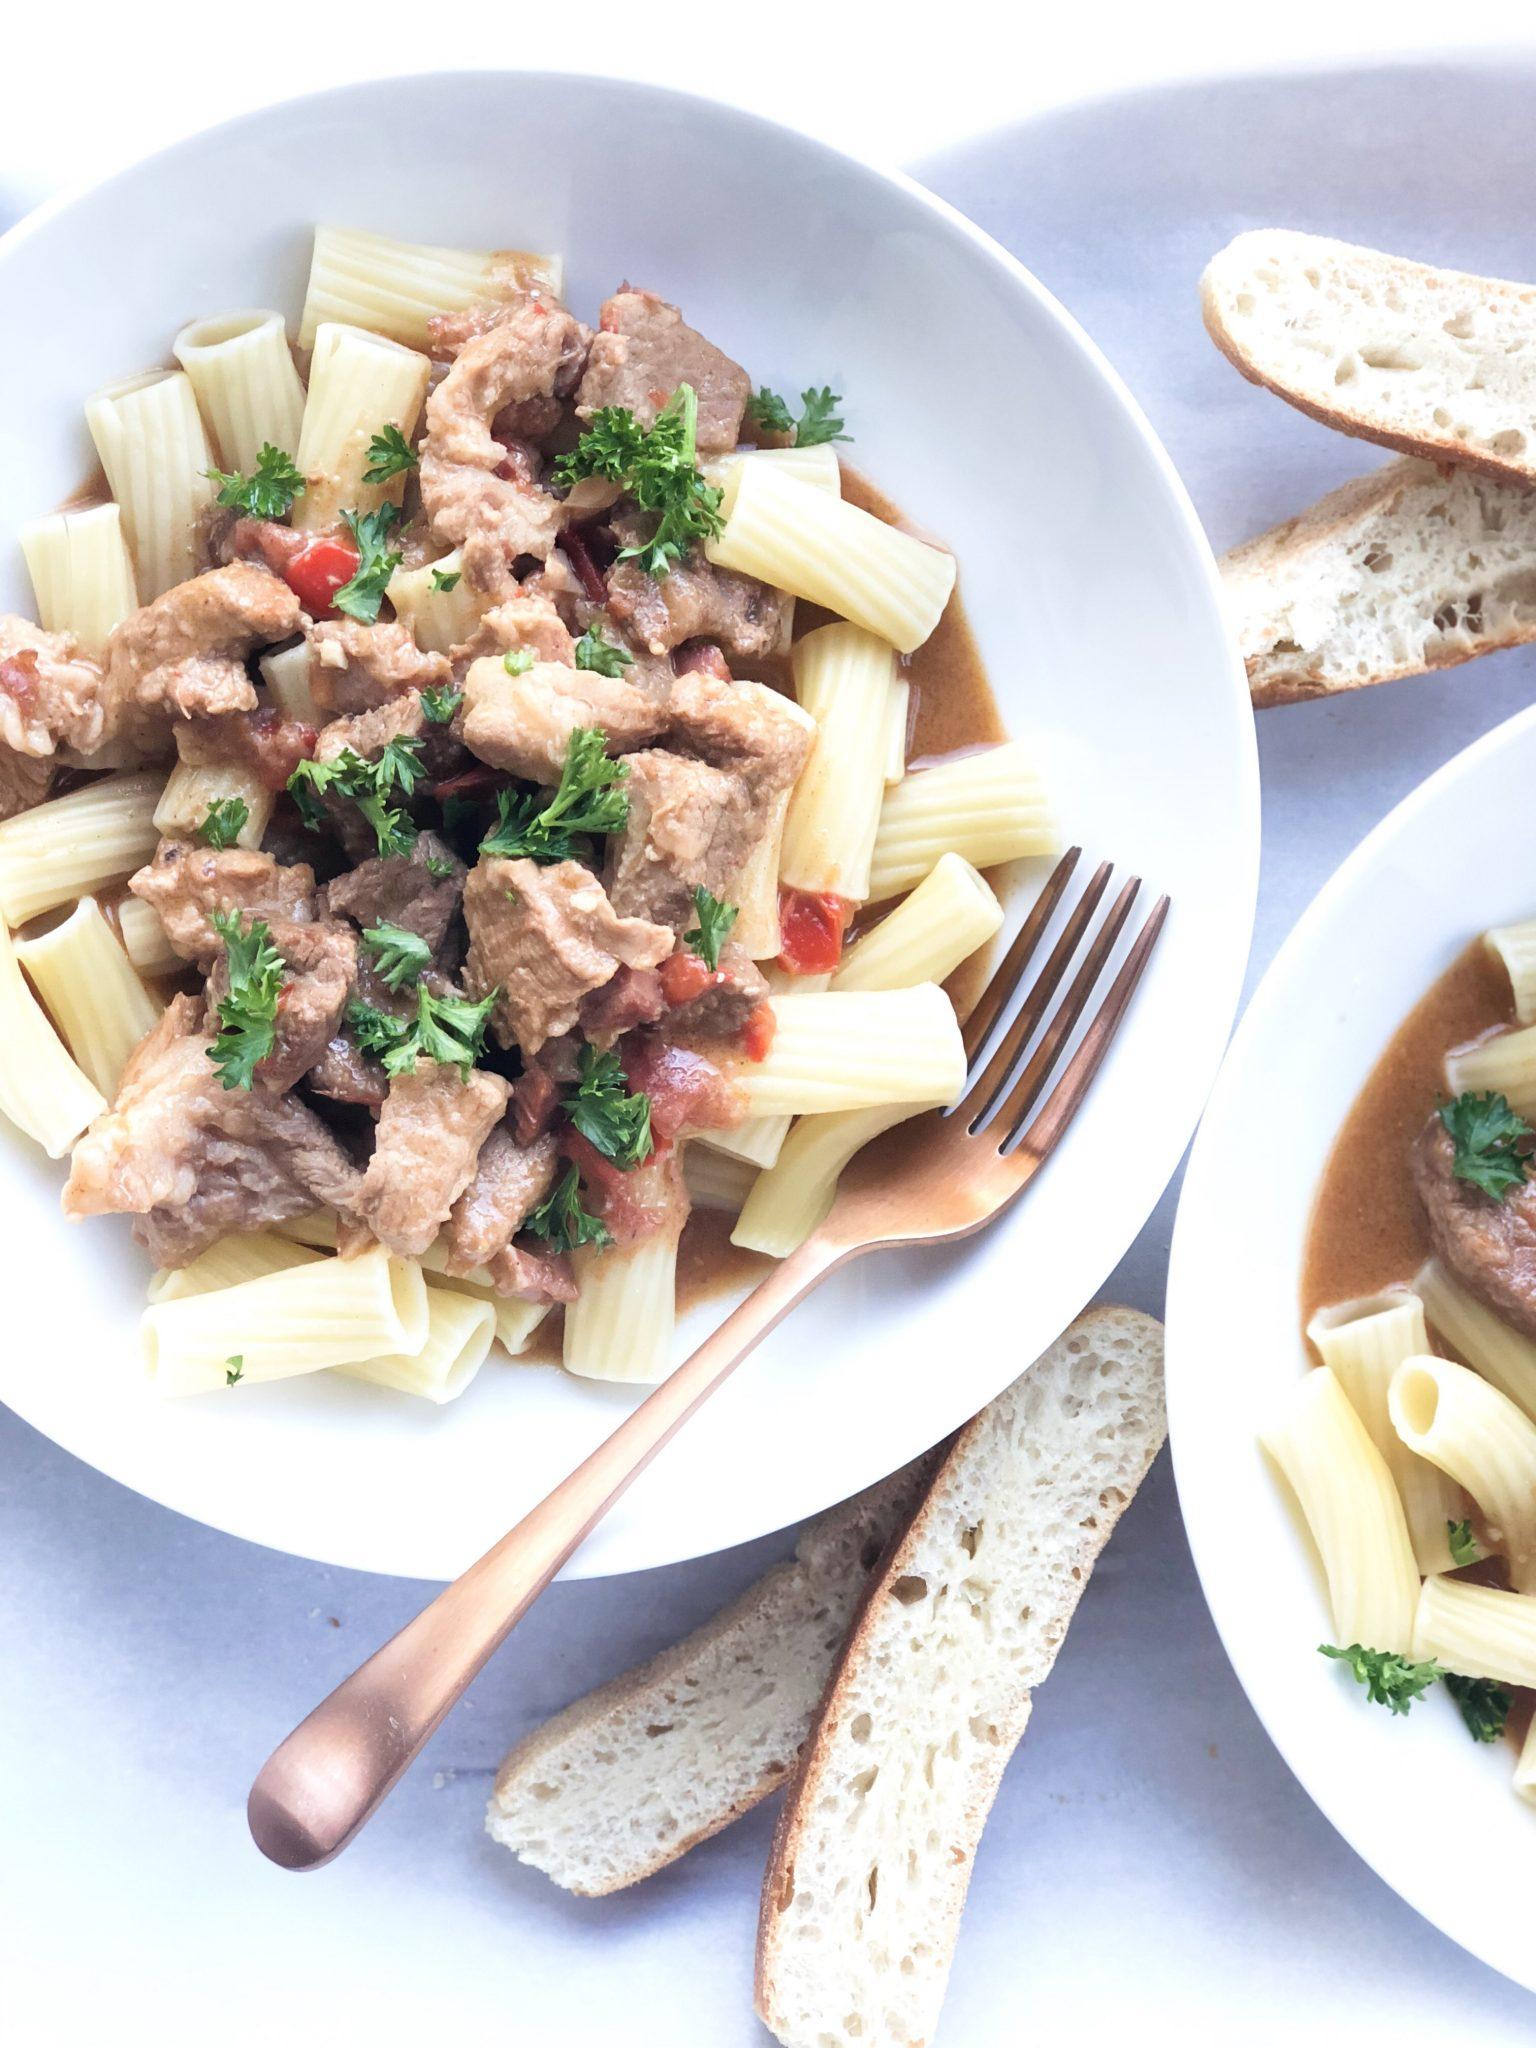 Hungarian Stew with Noodles-Pörkölt